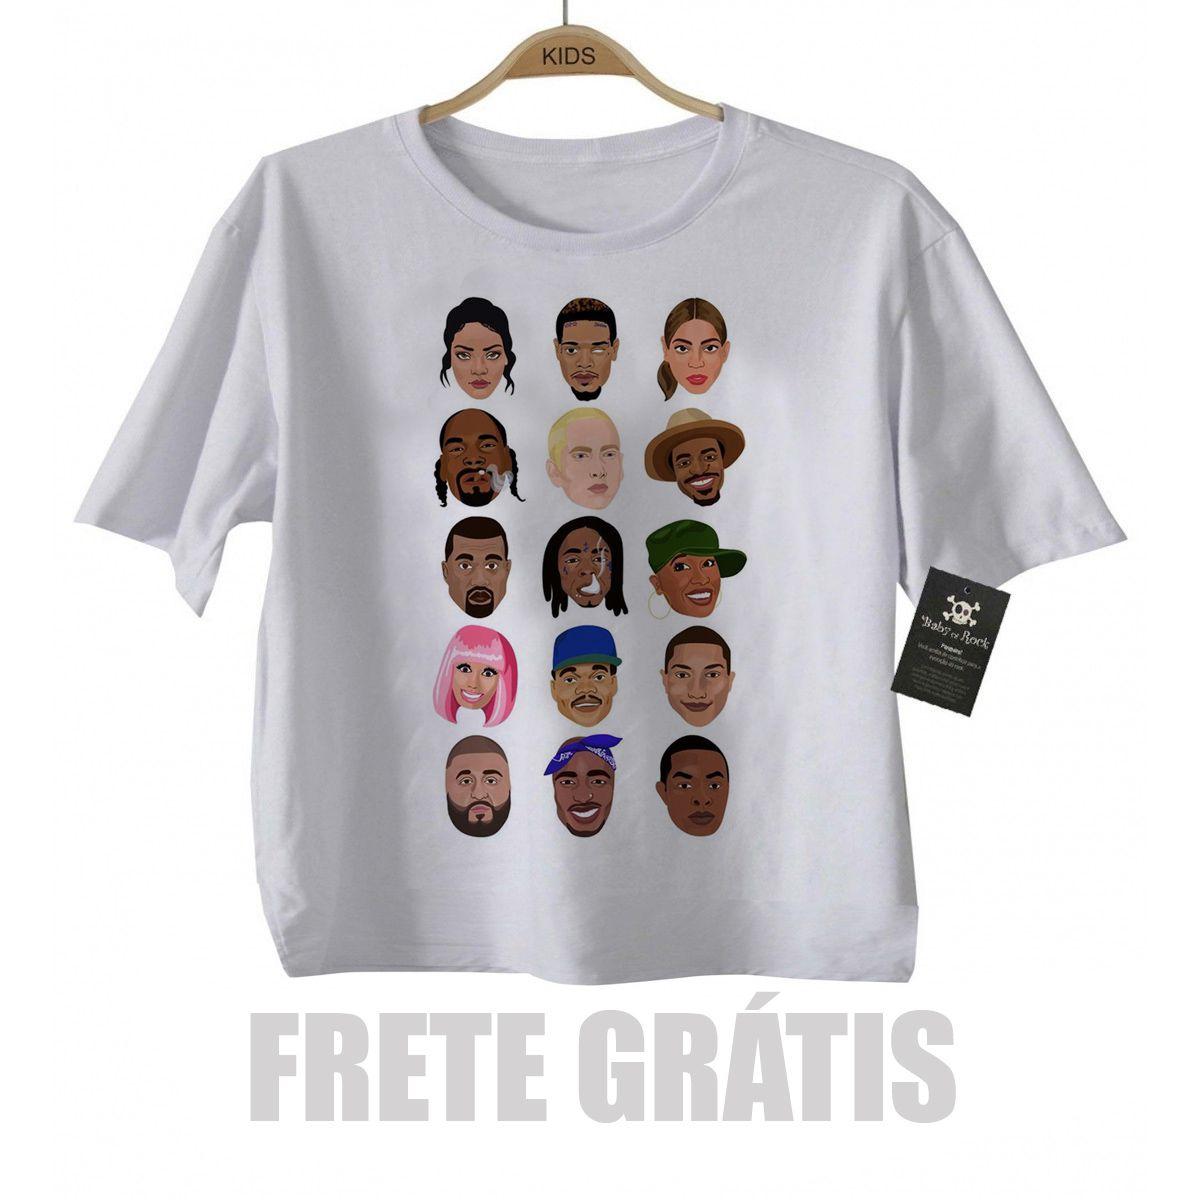 Camiseta infantil  Rap / Hip hop  Rappers Stars - White  - Baby Monster S/A